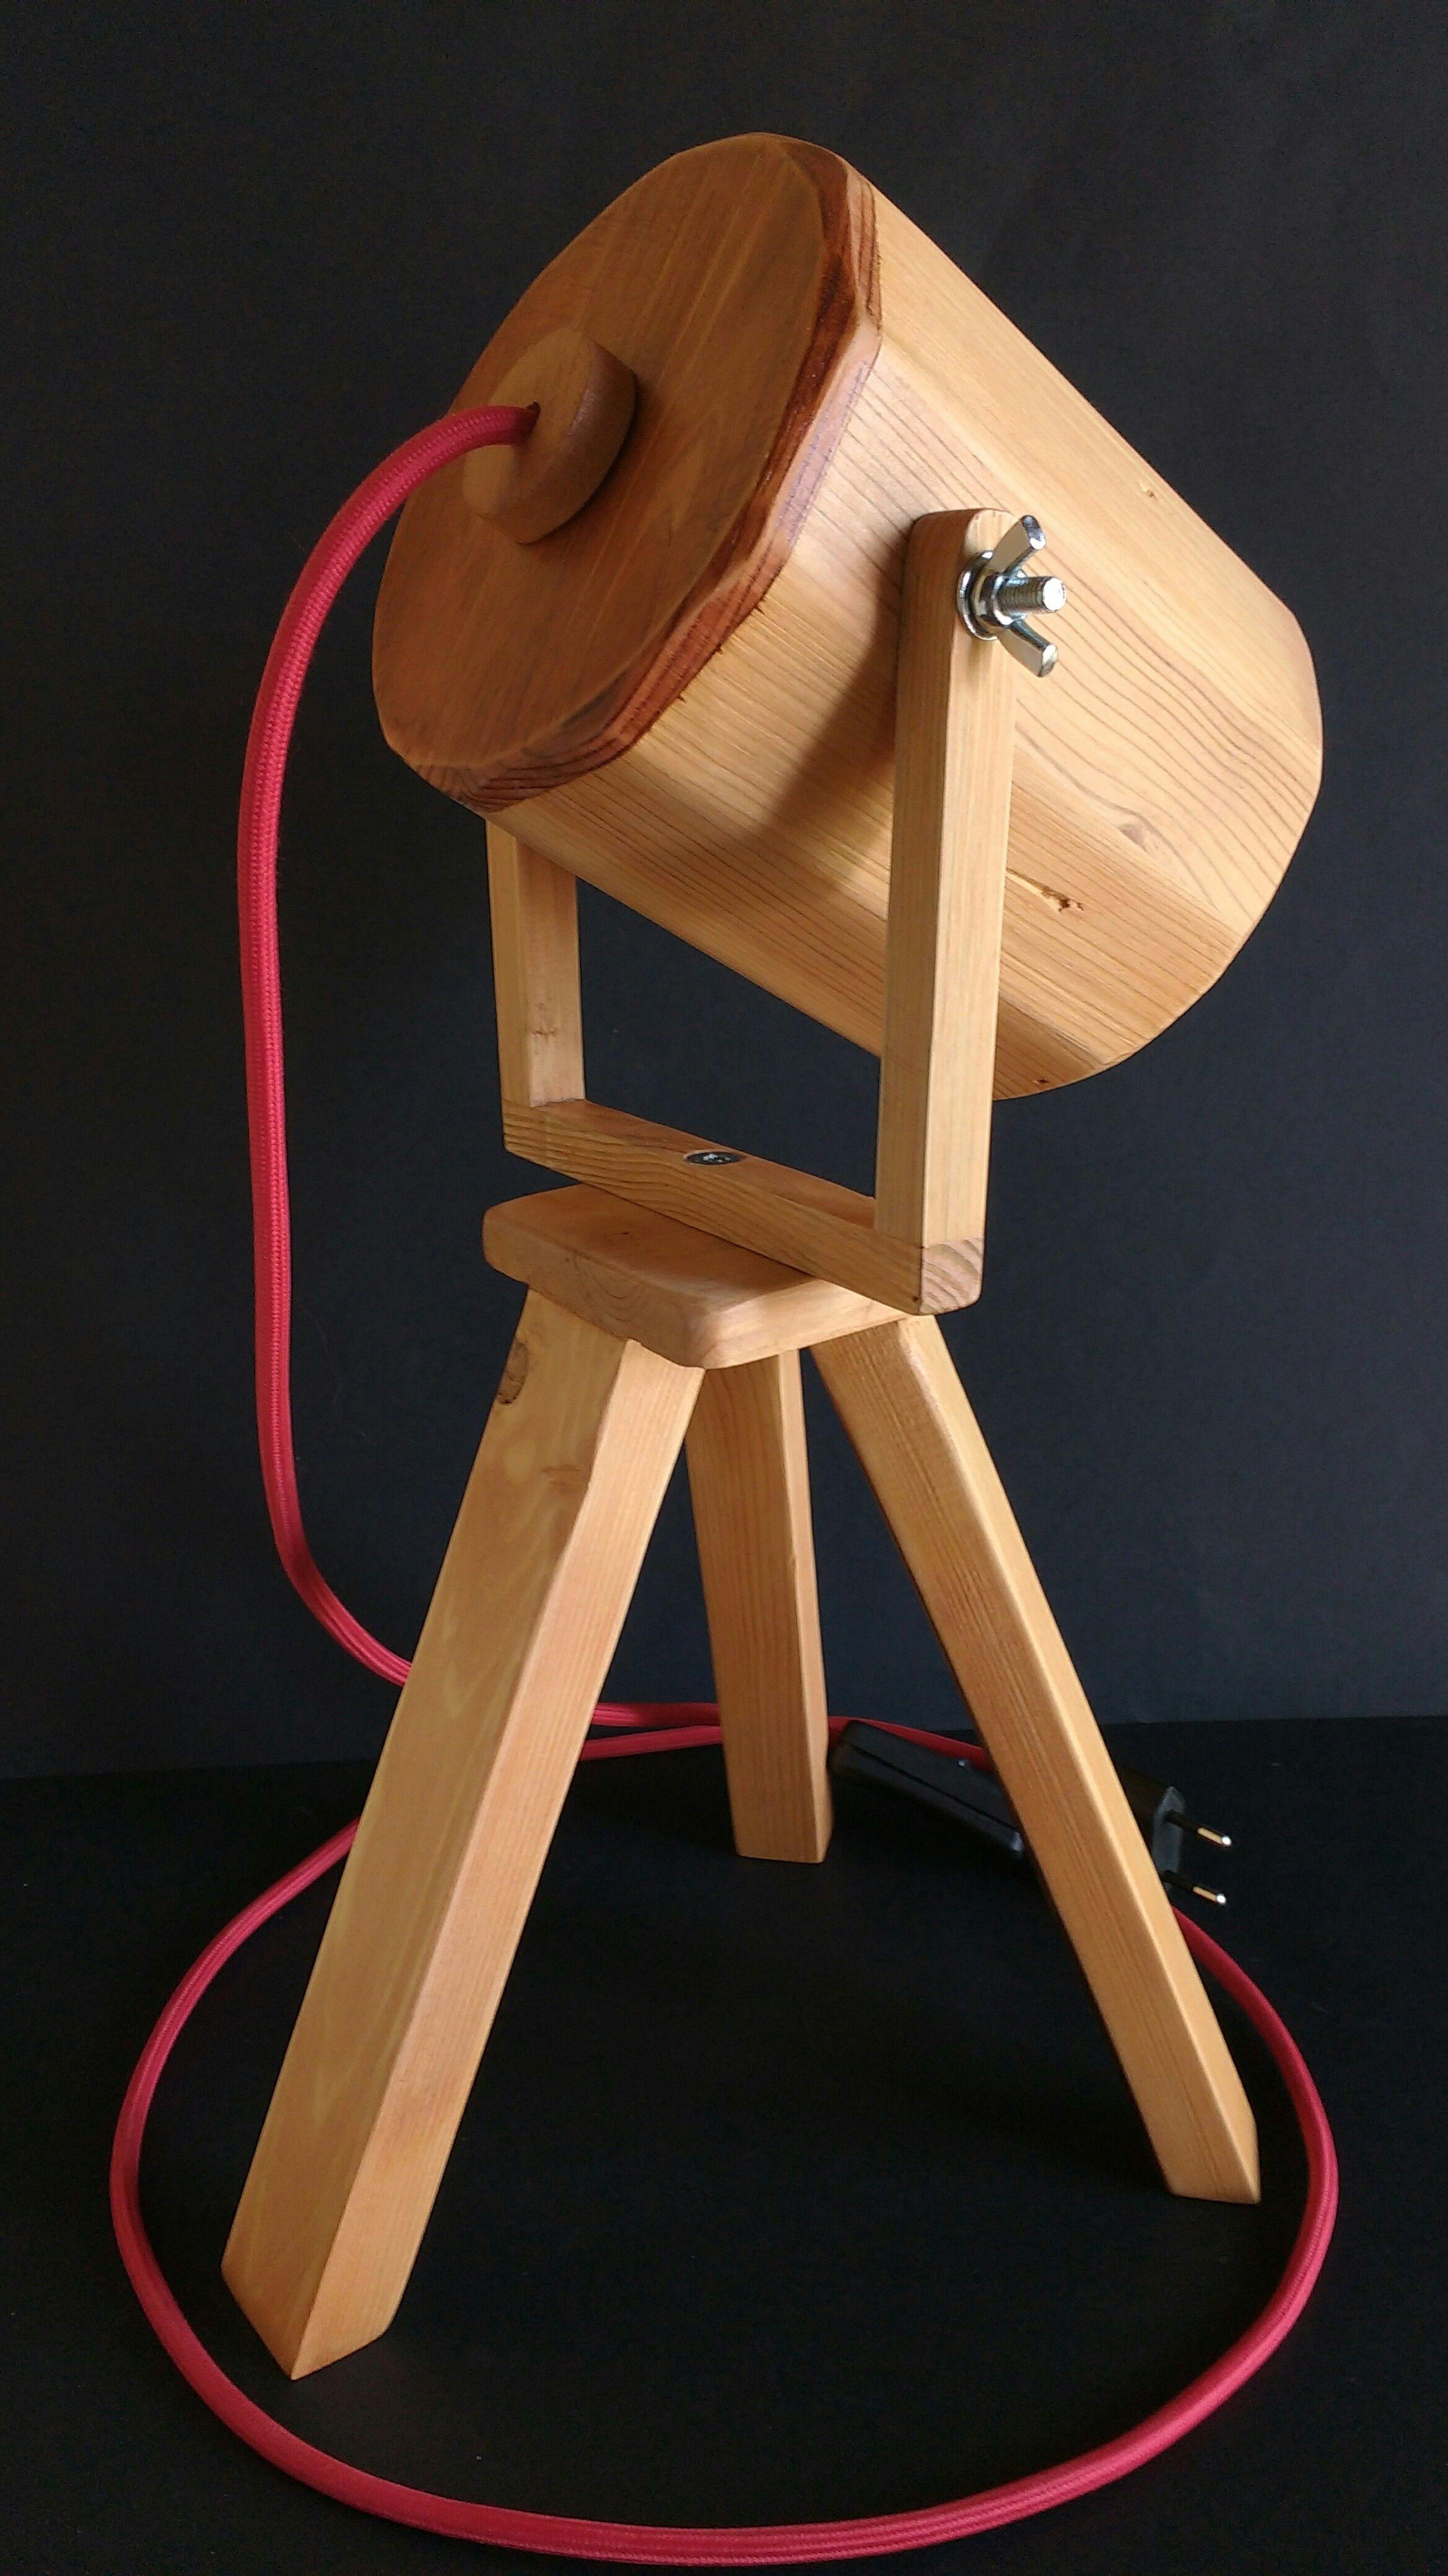 madera mano hecha trípode en de Lámpara reciclada palet a de qpGSUMVz